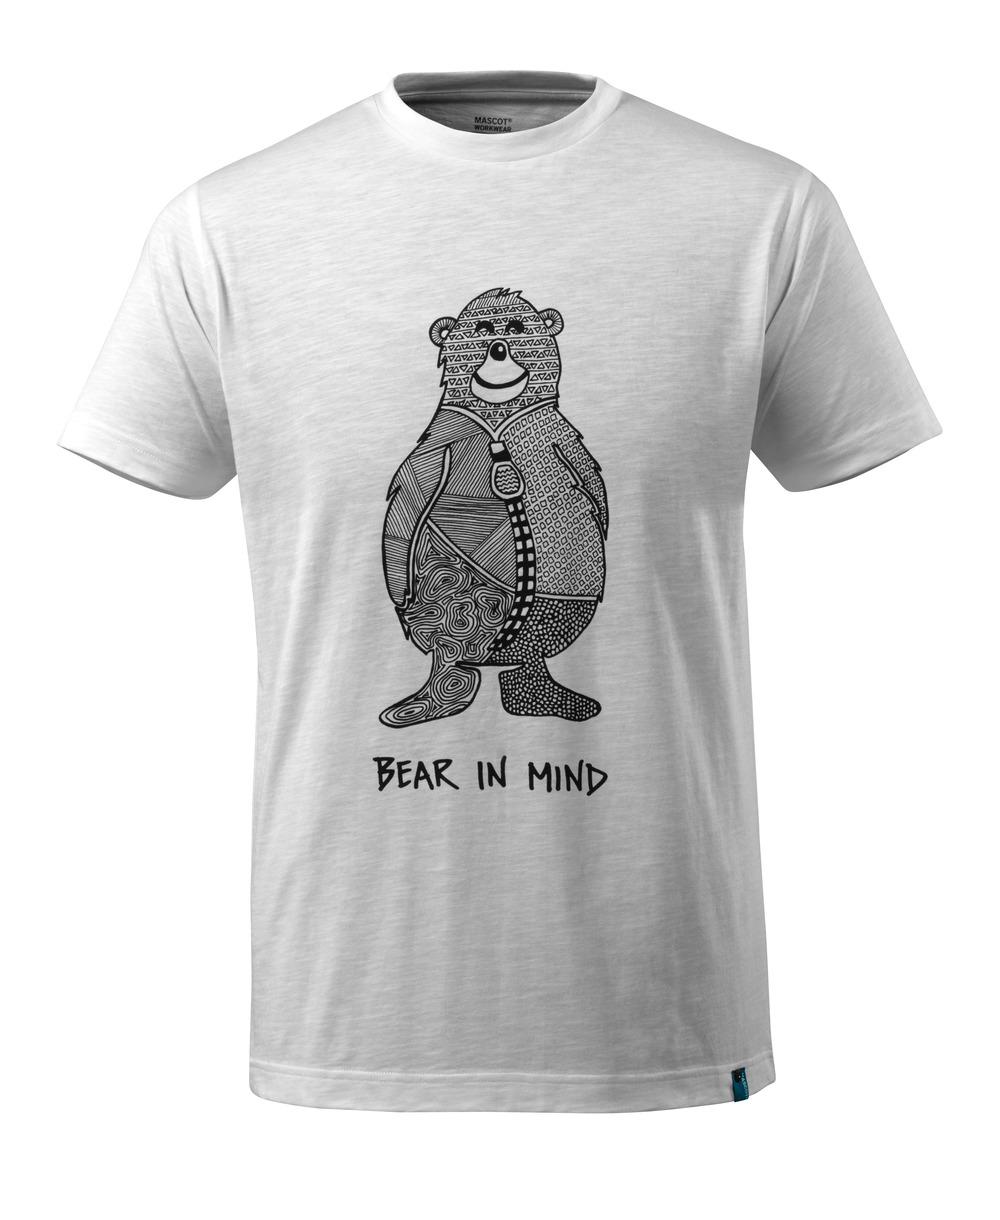 17381-983-06 T-shirt - Blanc